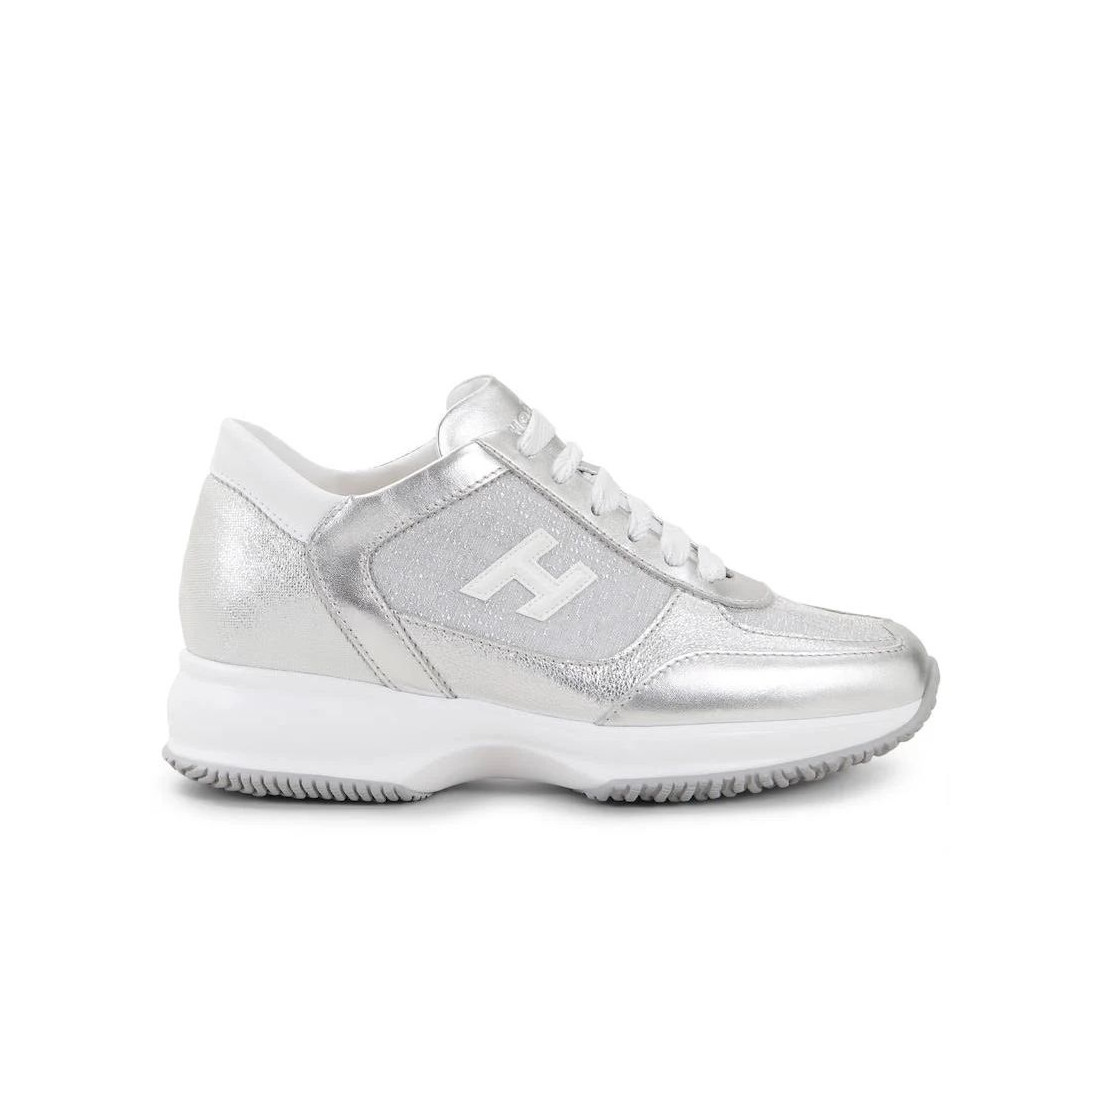 sneakers woman hogan hxw00n0bh50myx8844 6812